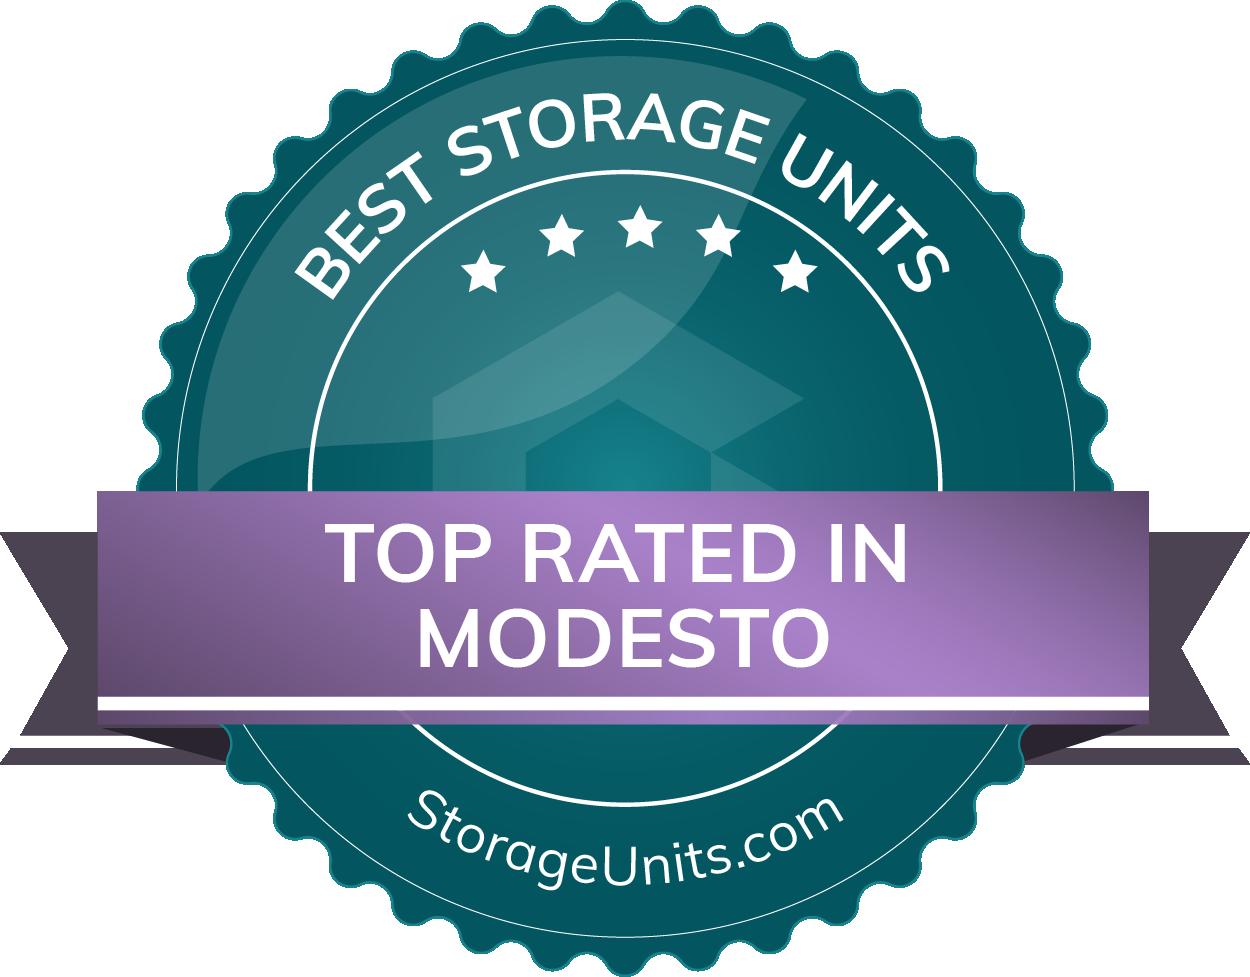 Best Self Storage Units in Modesto, CA